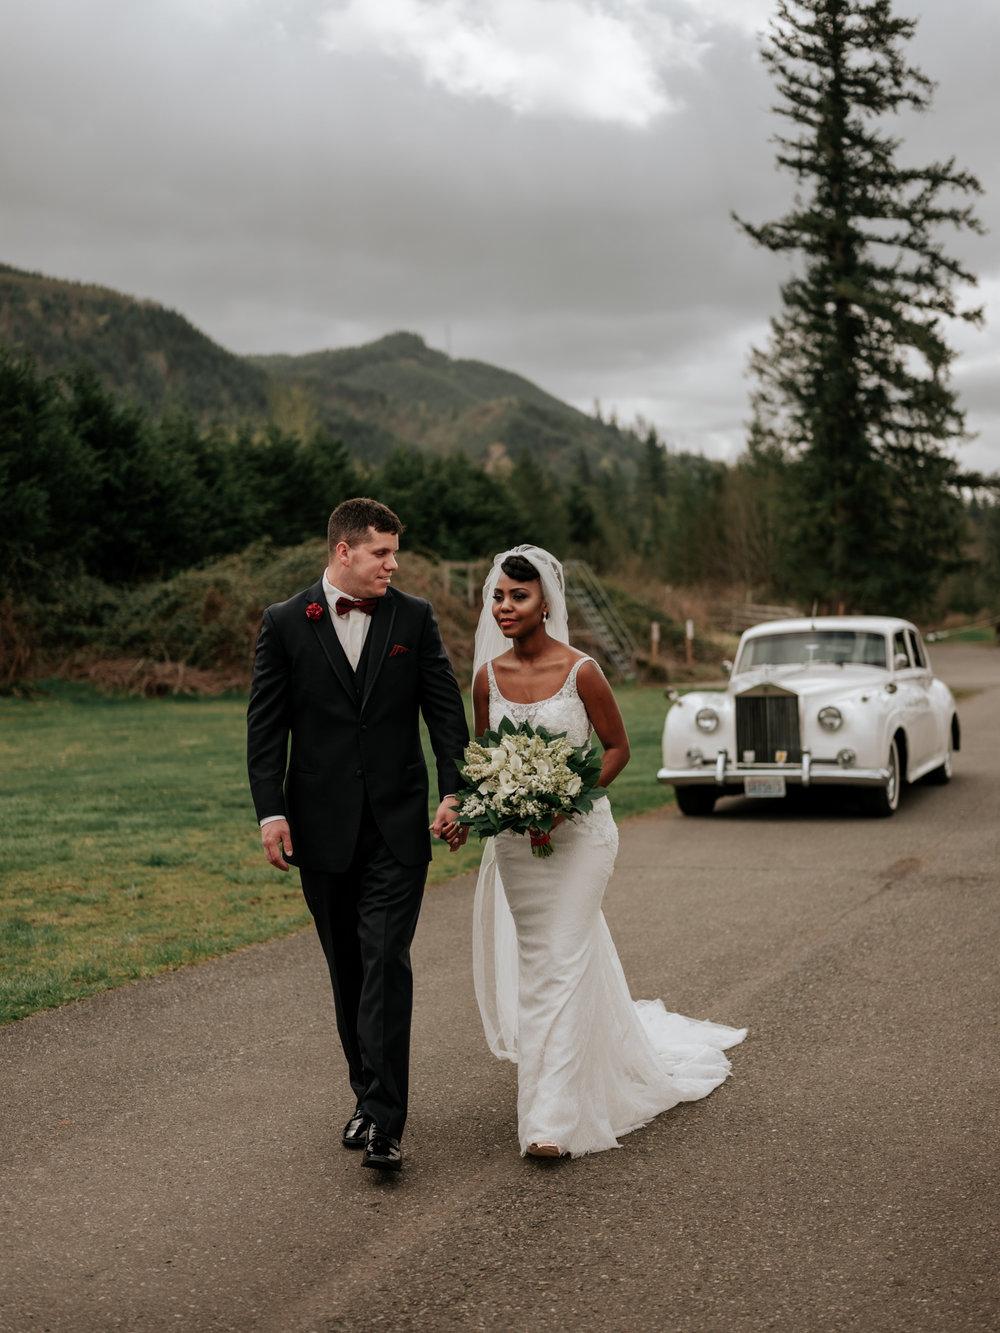 Stolen Glimpses Seattle Wedding Photographer at Rein Fire Ranch 17.jpg